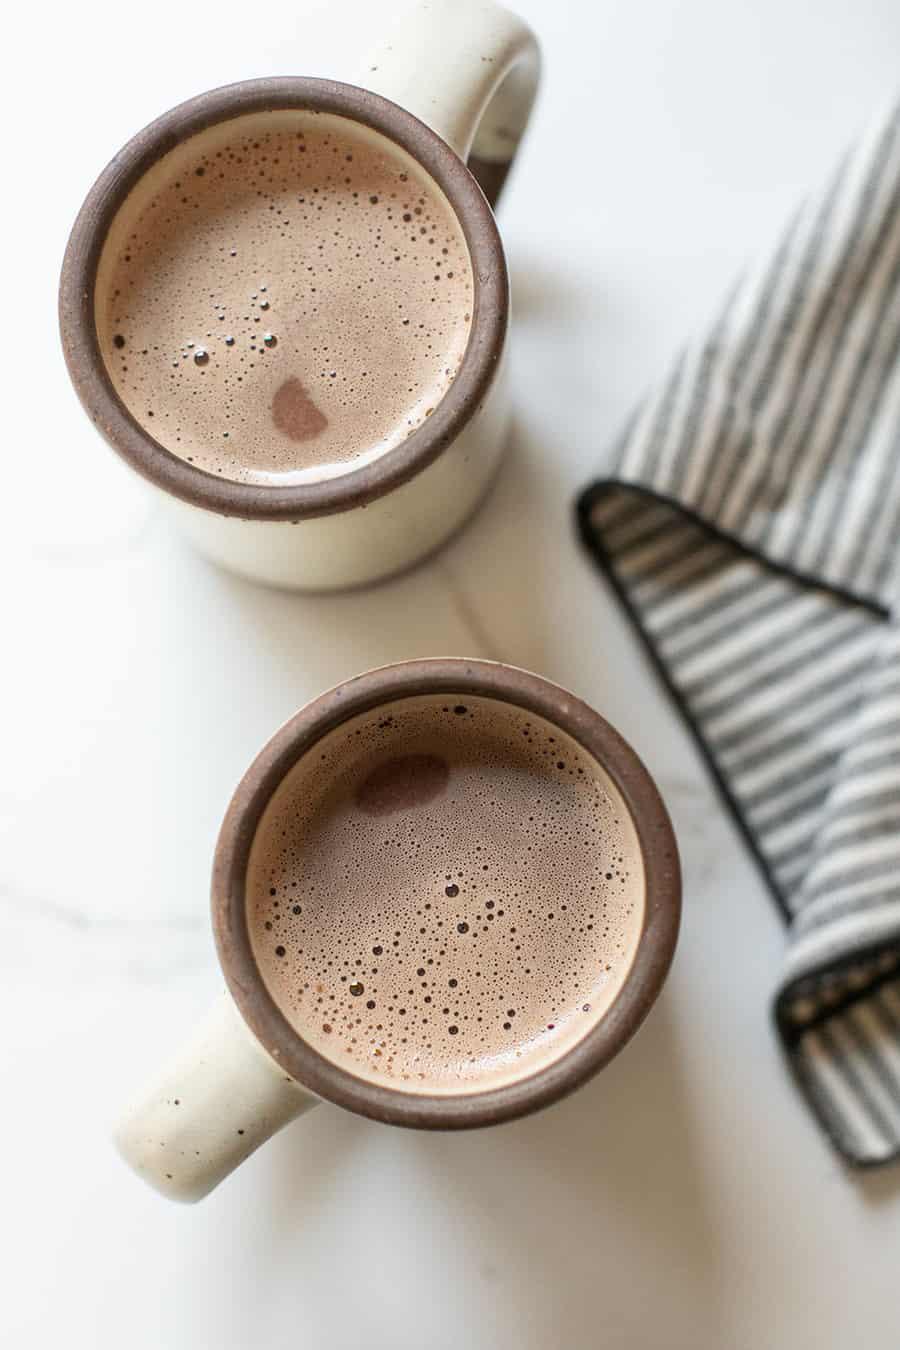 The best hot chocolate recipe in large mugs.